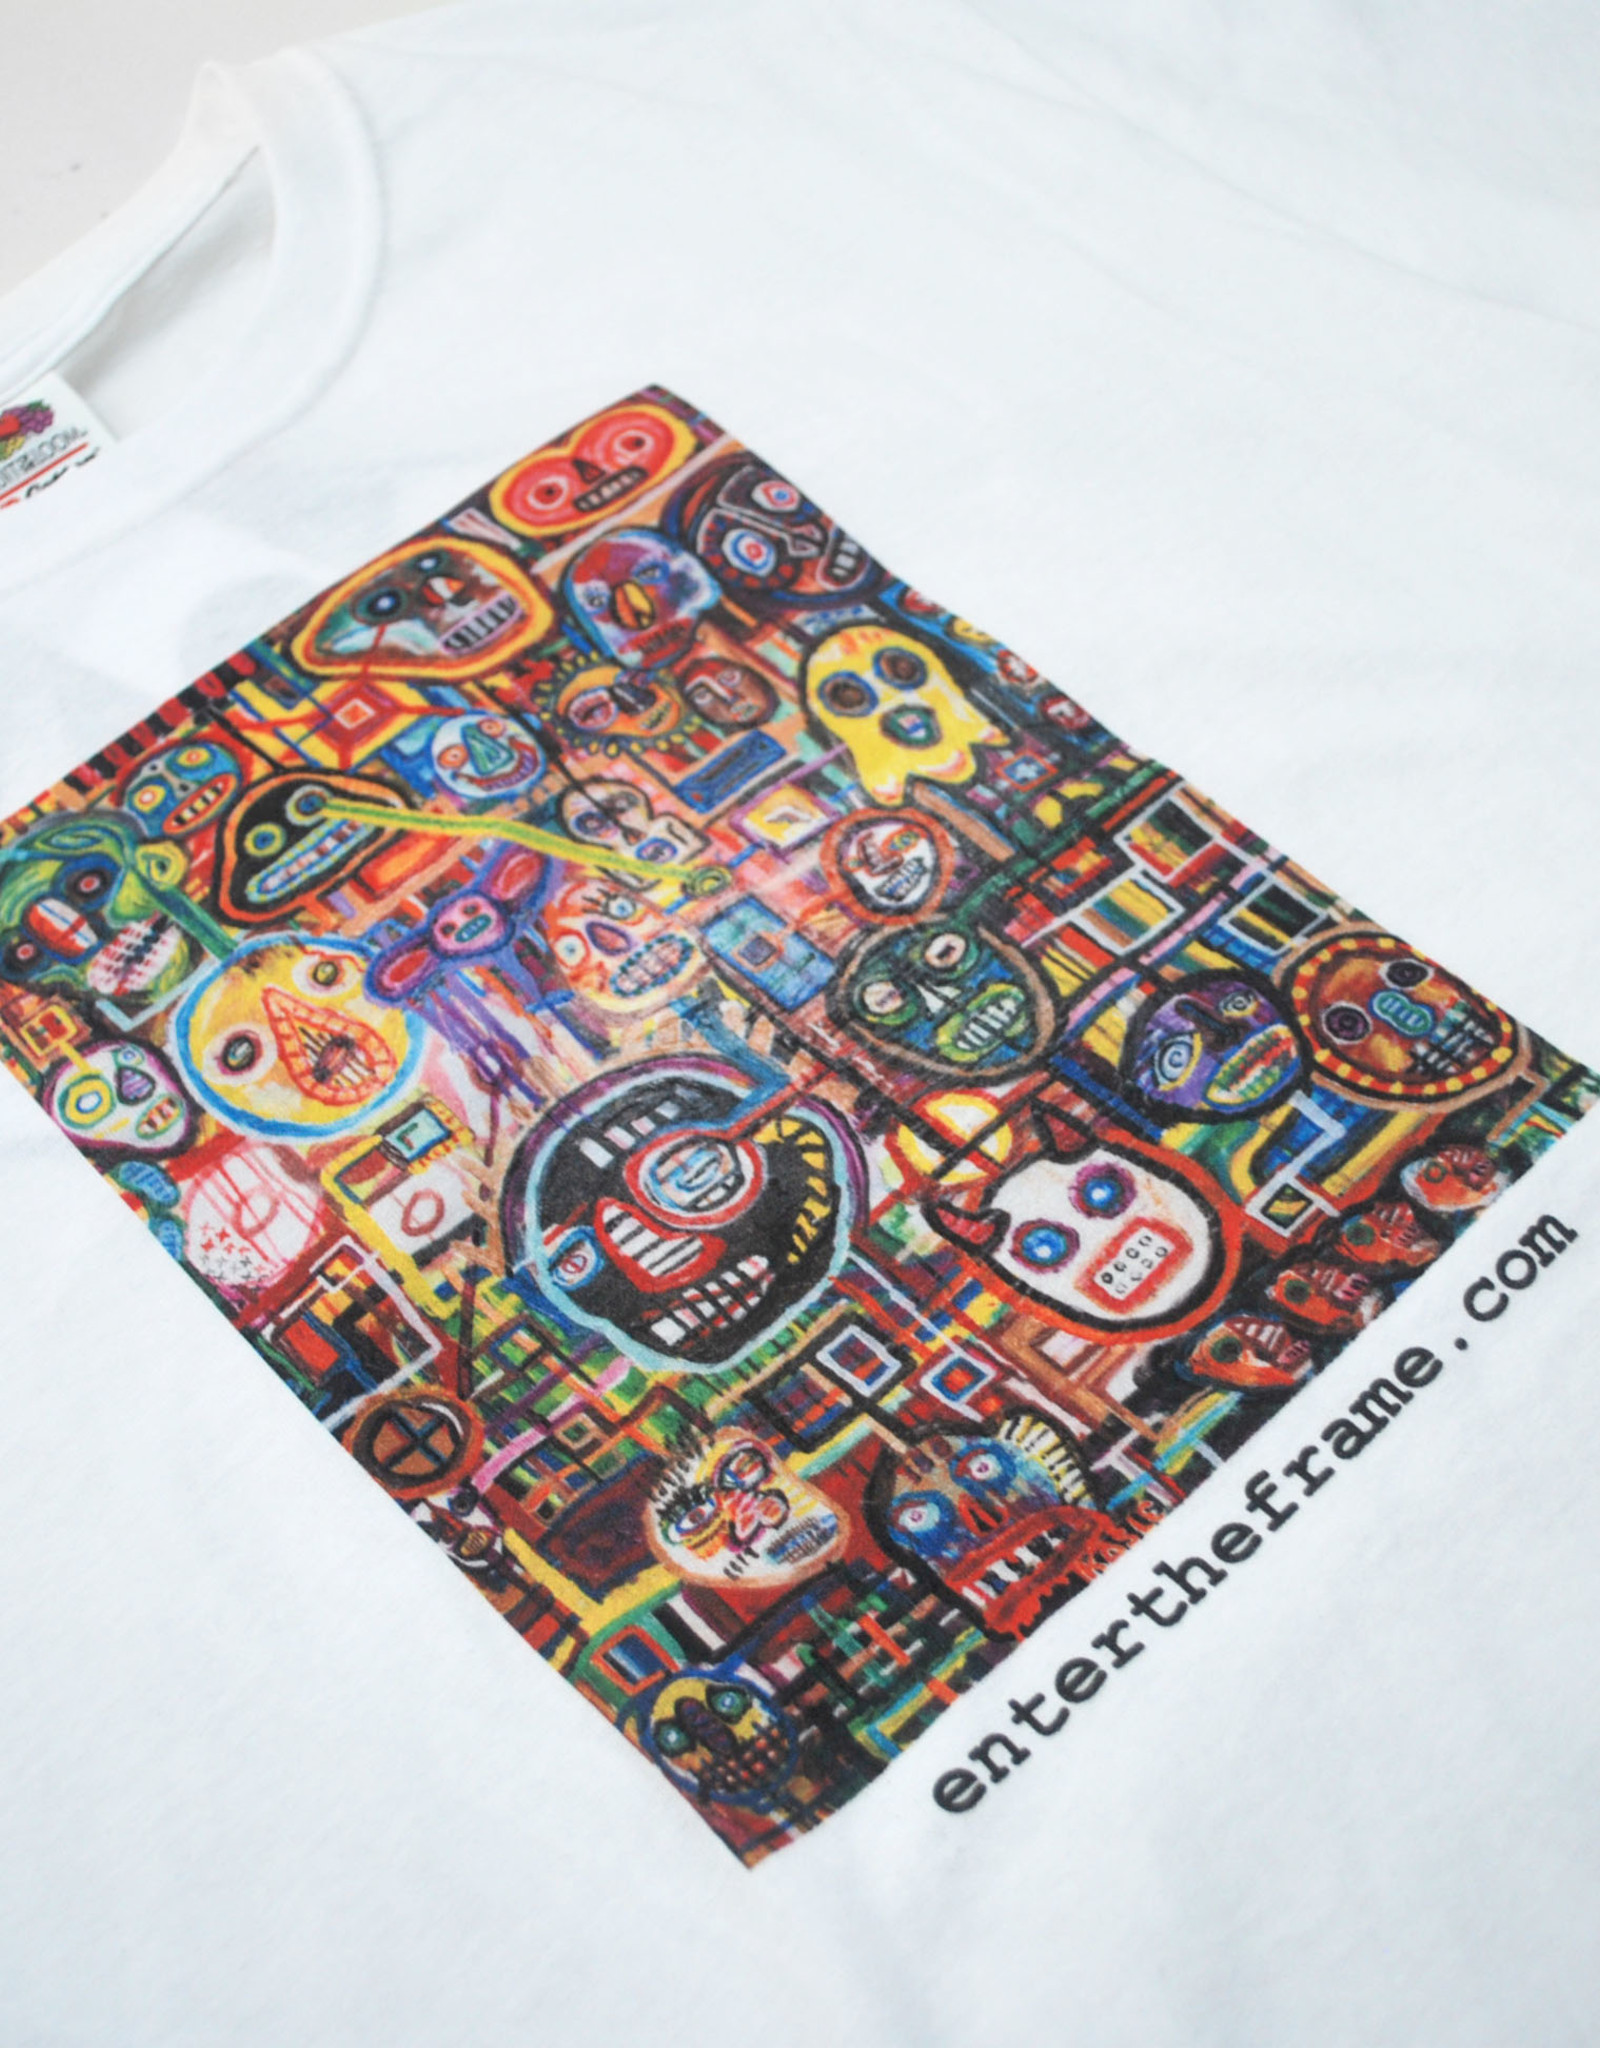 """Arcadia"" Tee Shirt (Medium) by Evan Kasle"